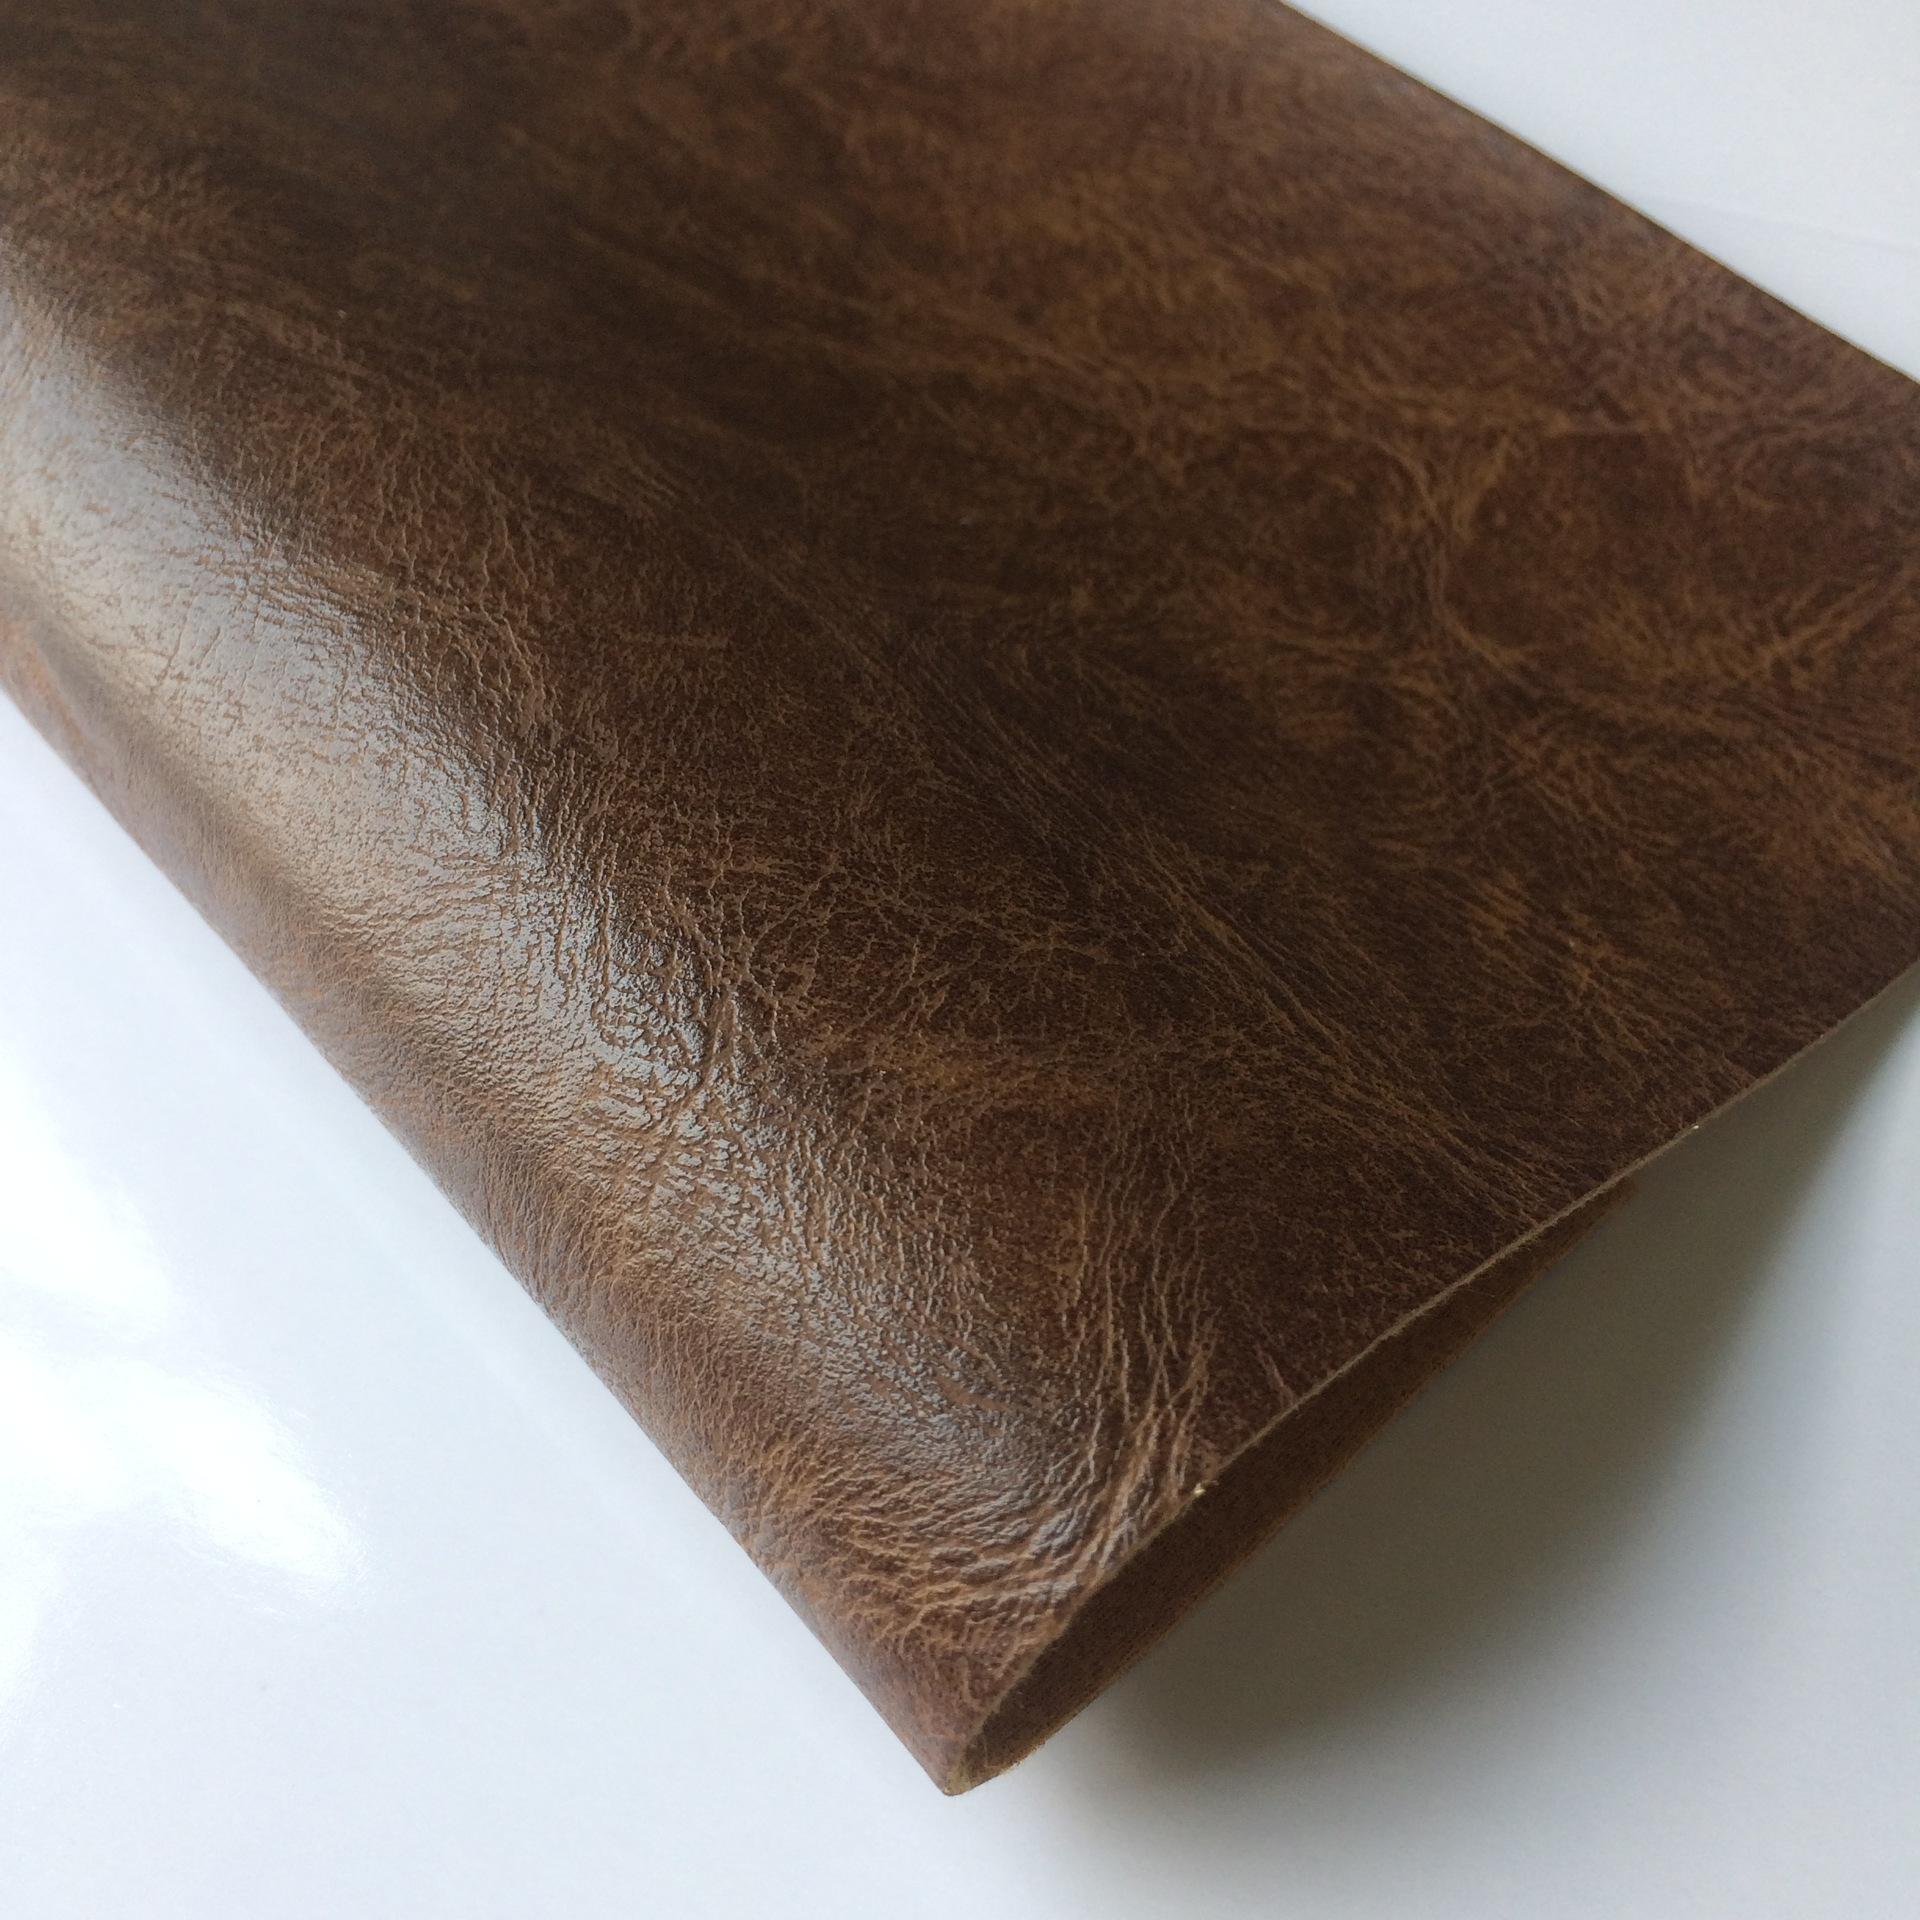 DINGTIAN Half pu two-color retro imitation leather sofa upholstered seat furniture upholstery leathe